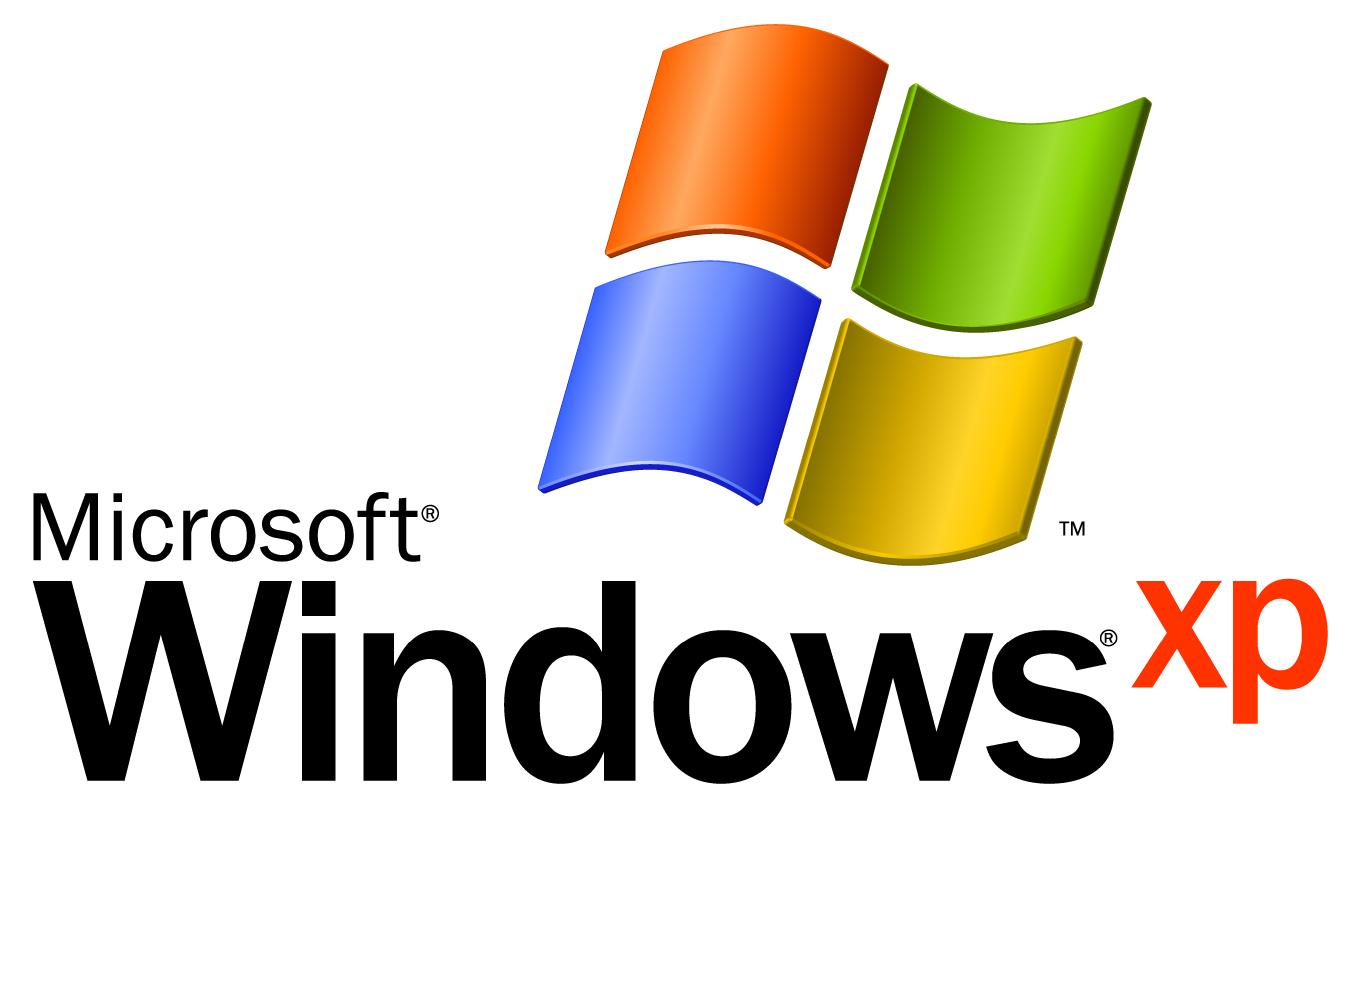 Windows 7 Logo Transparent Windows logo transparent